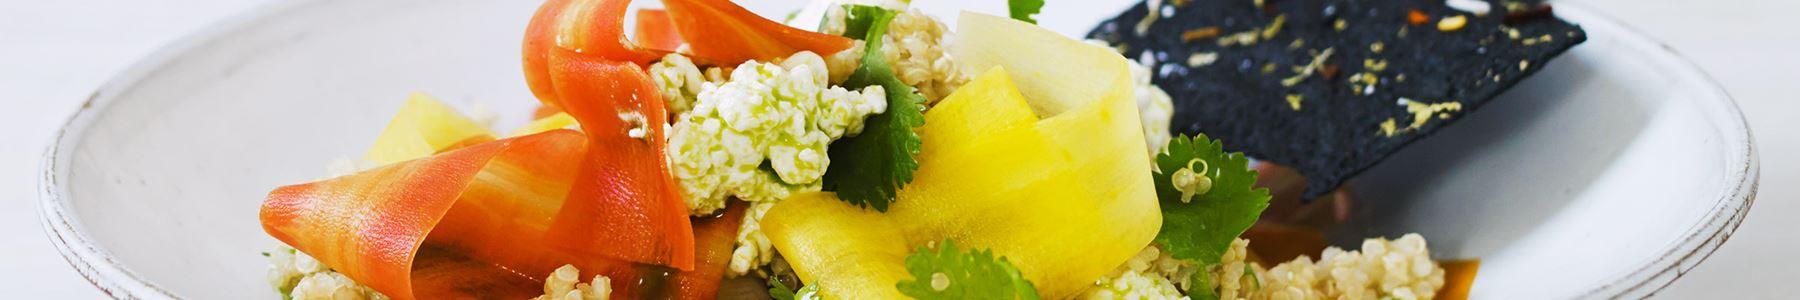 Morötter + Quinoa + Sallad